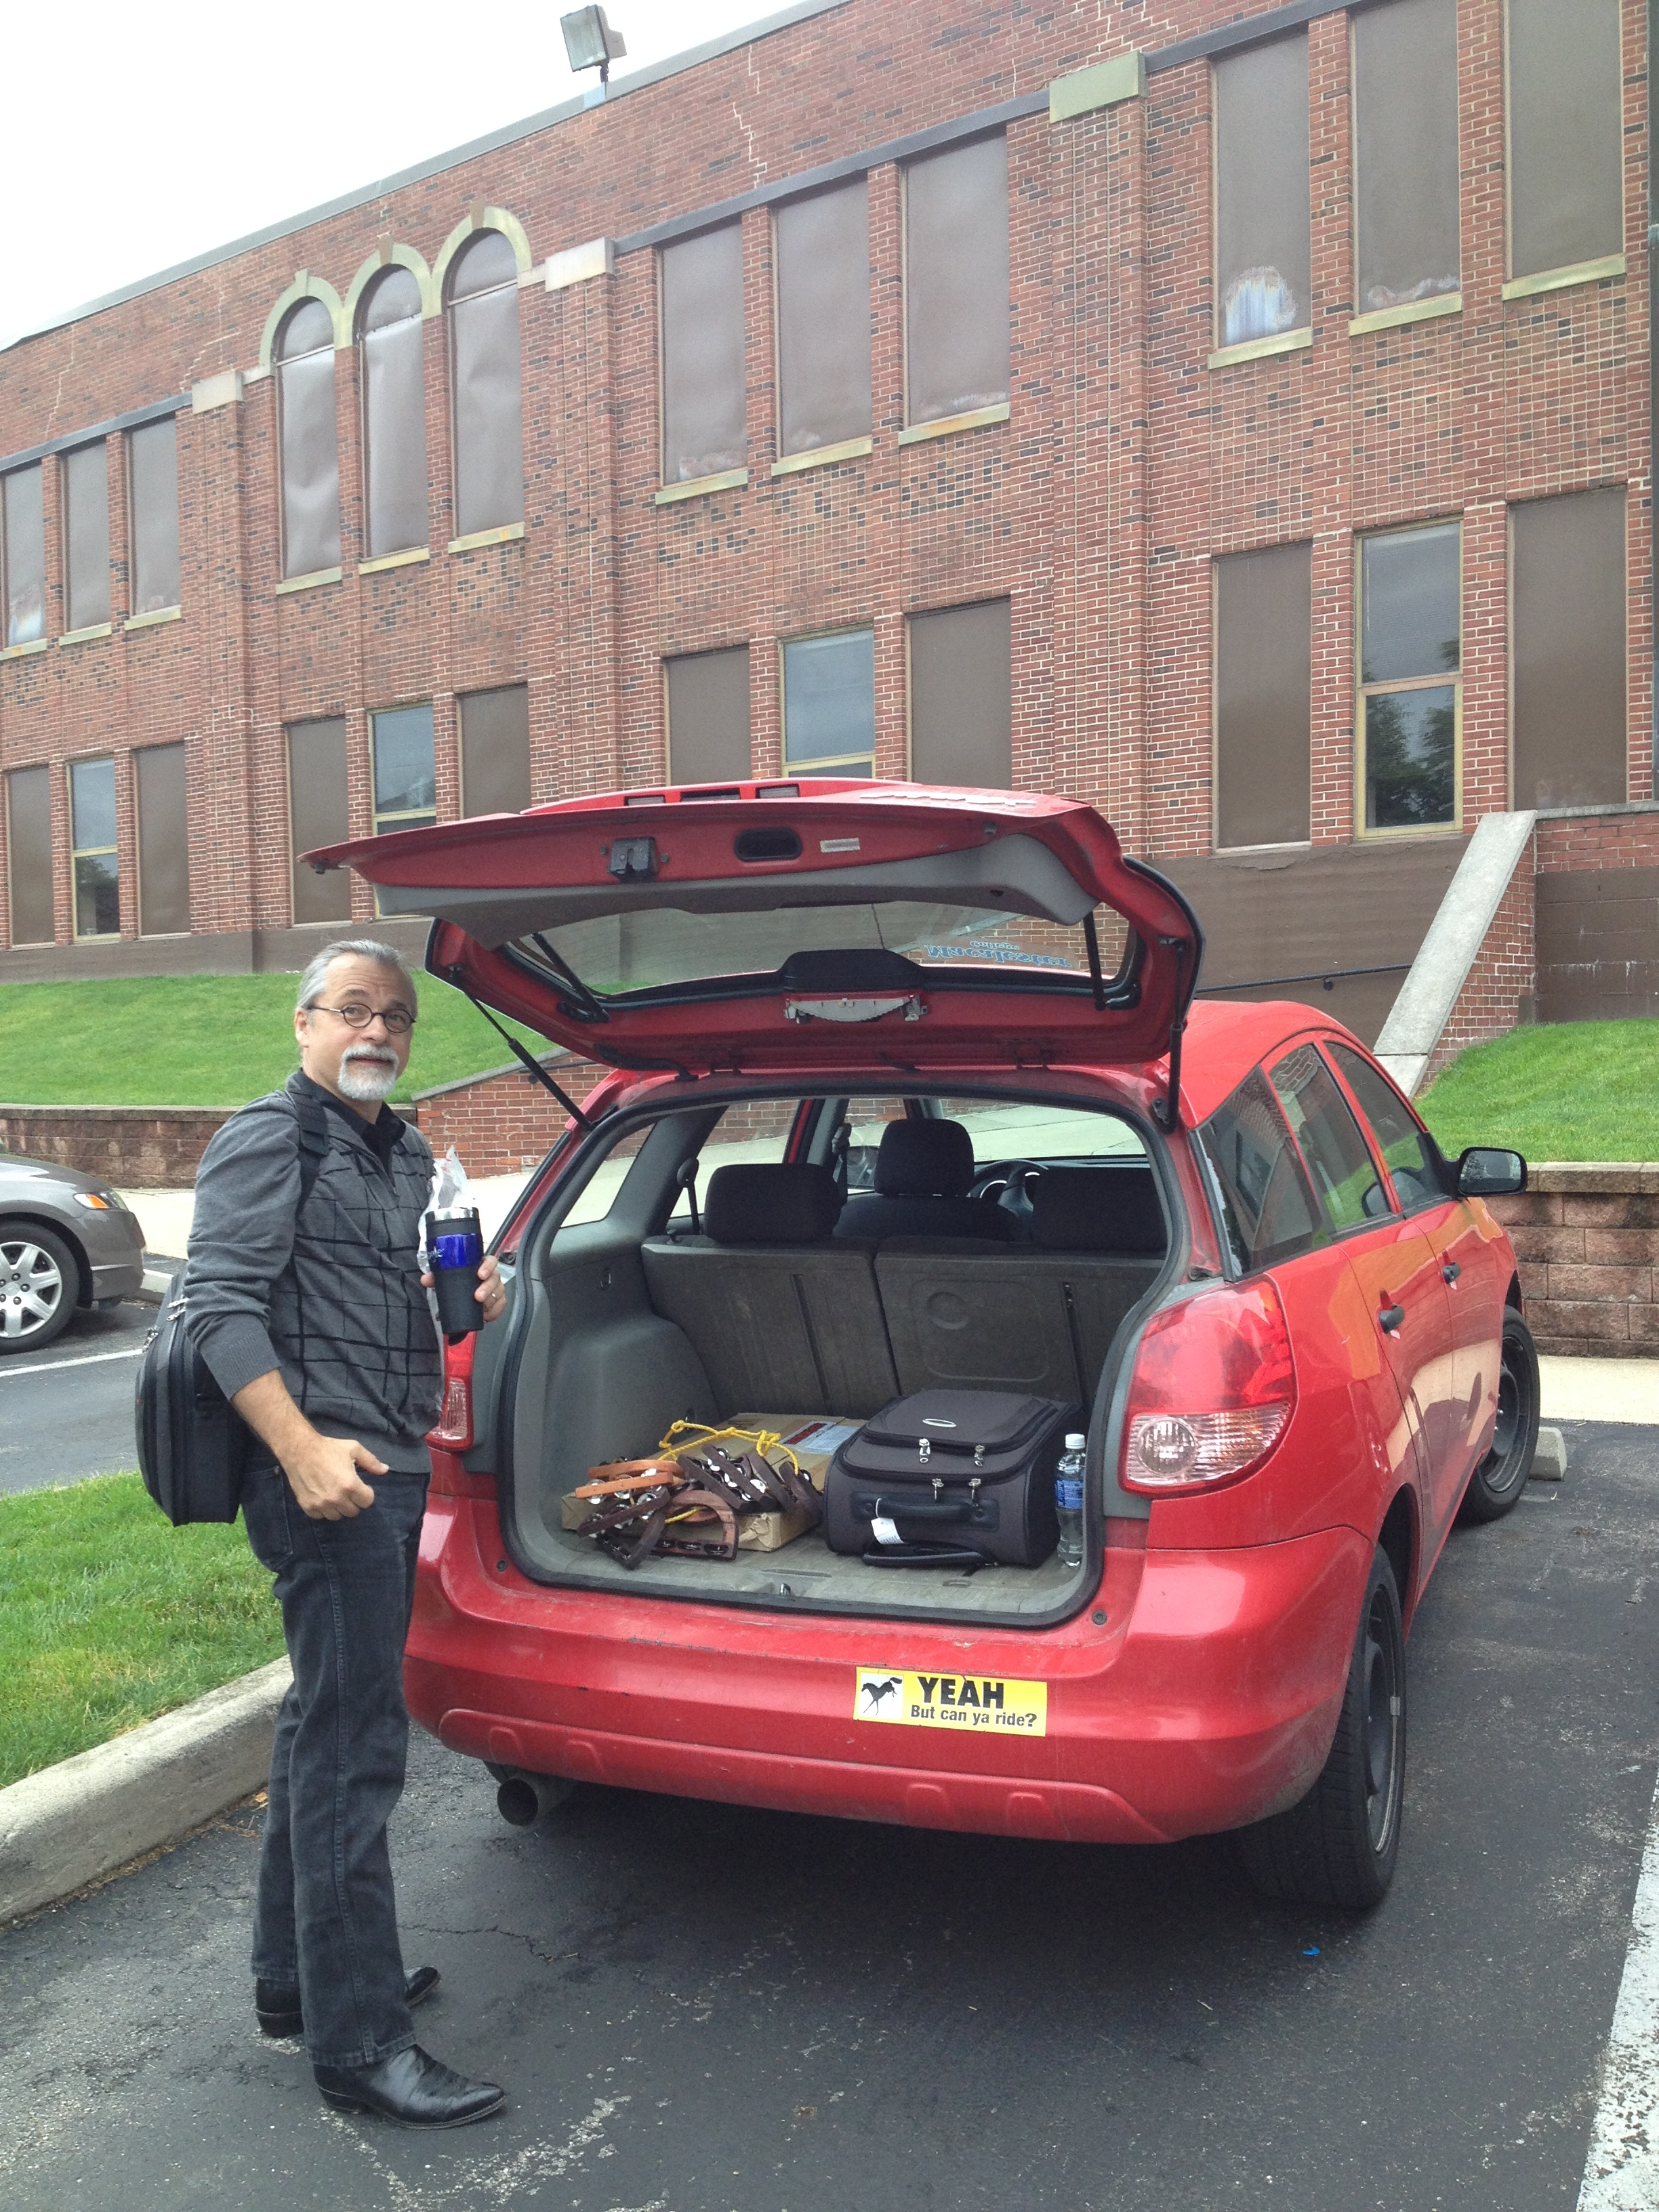 88 Creative Keys Travels To Ohio